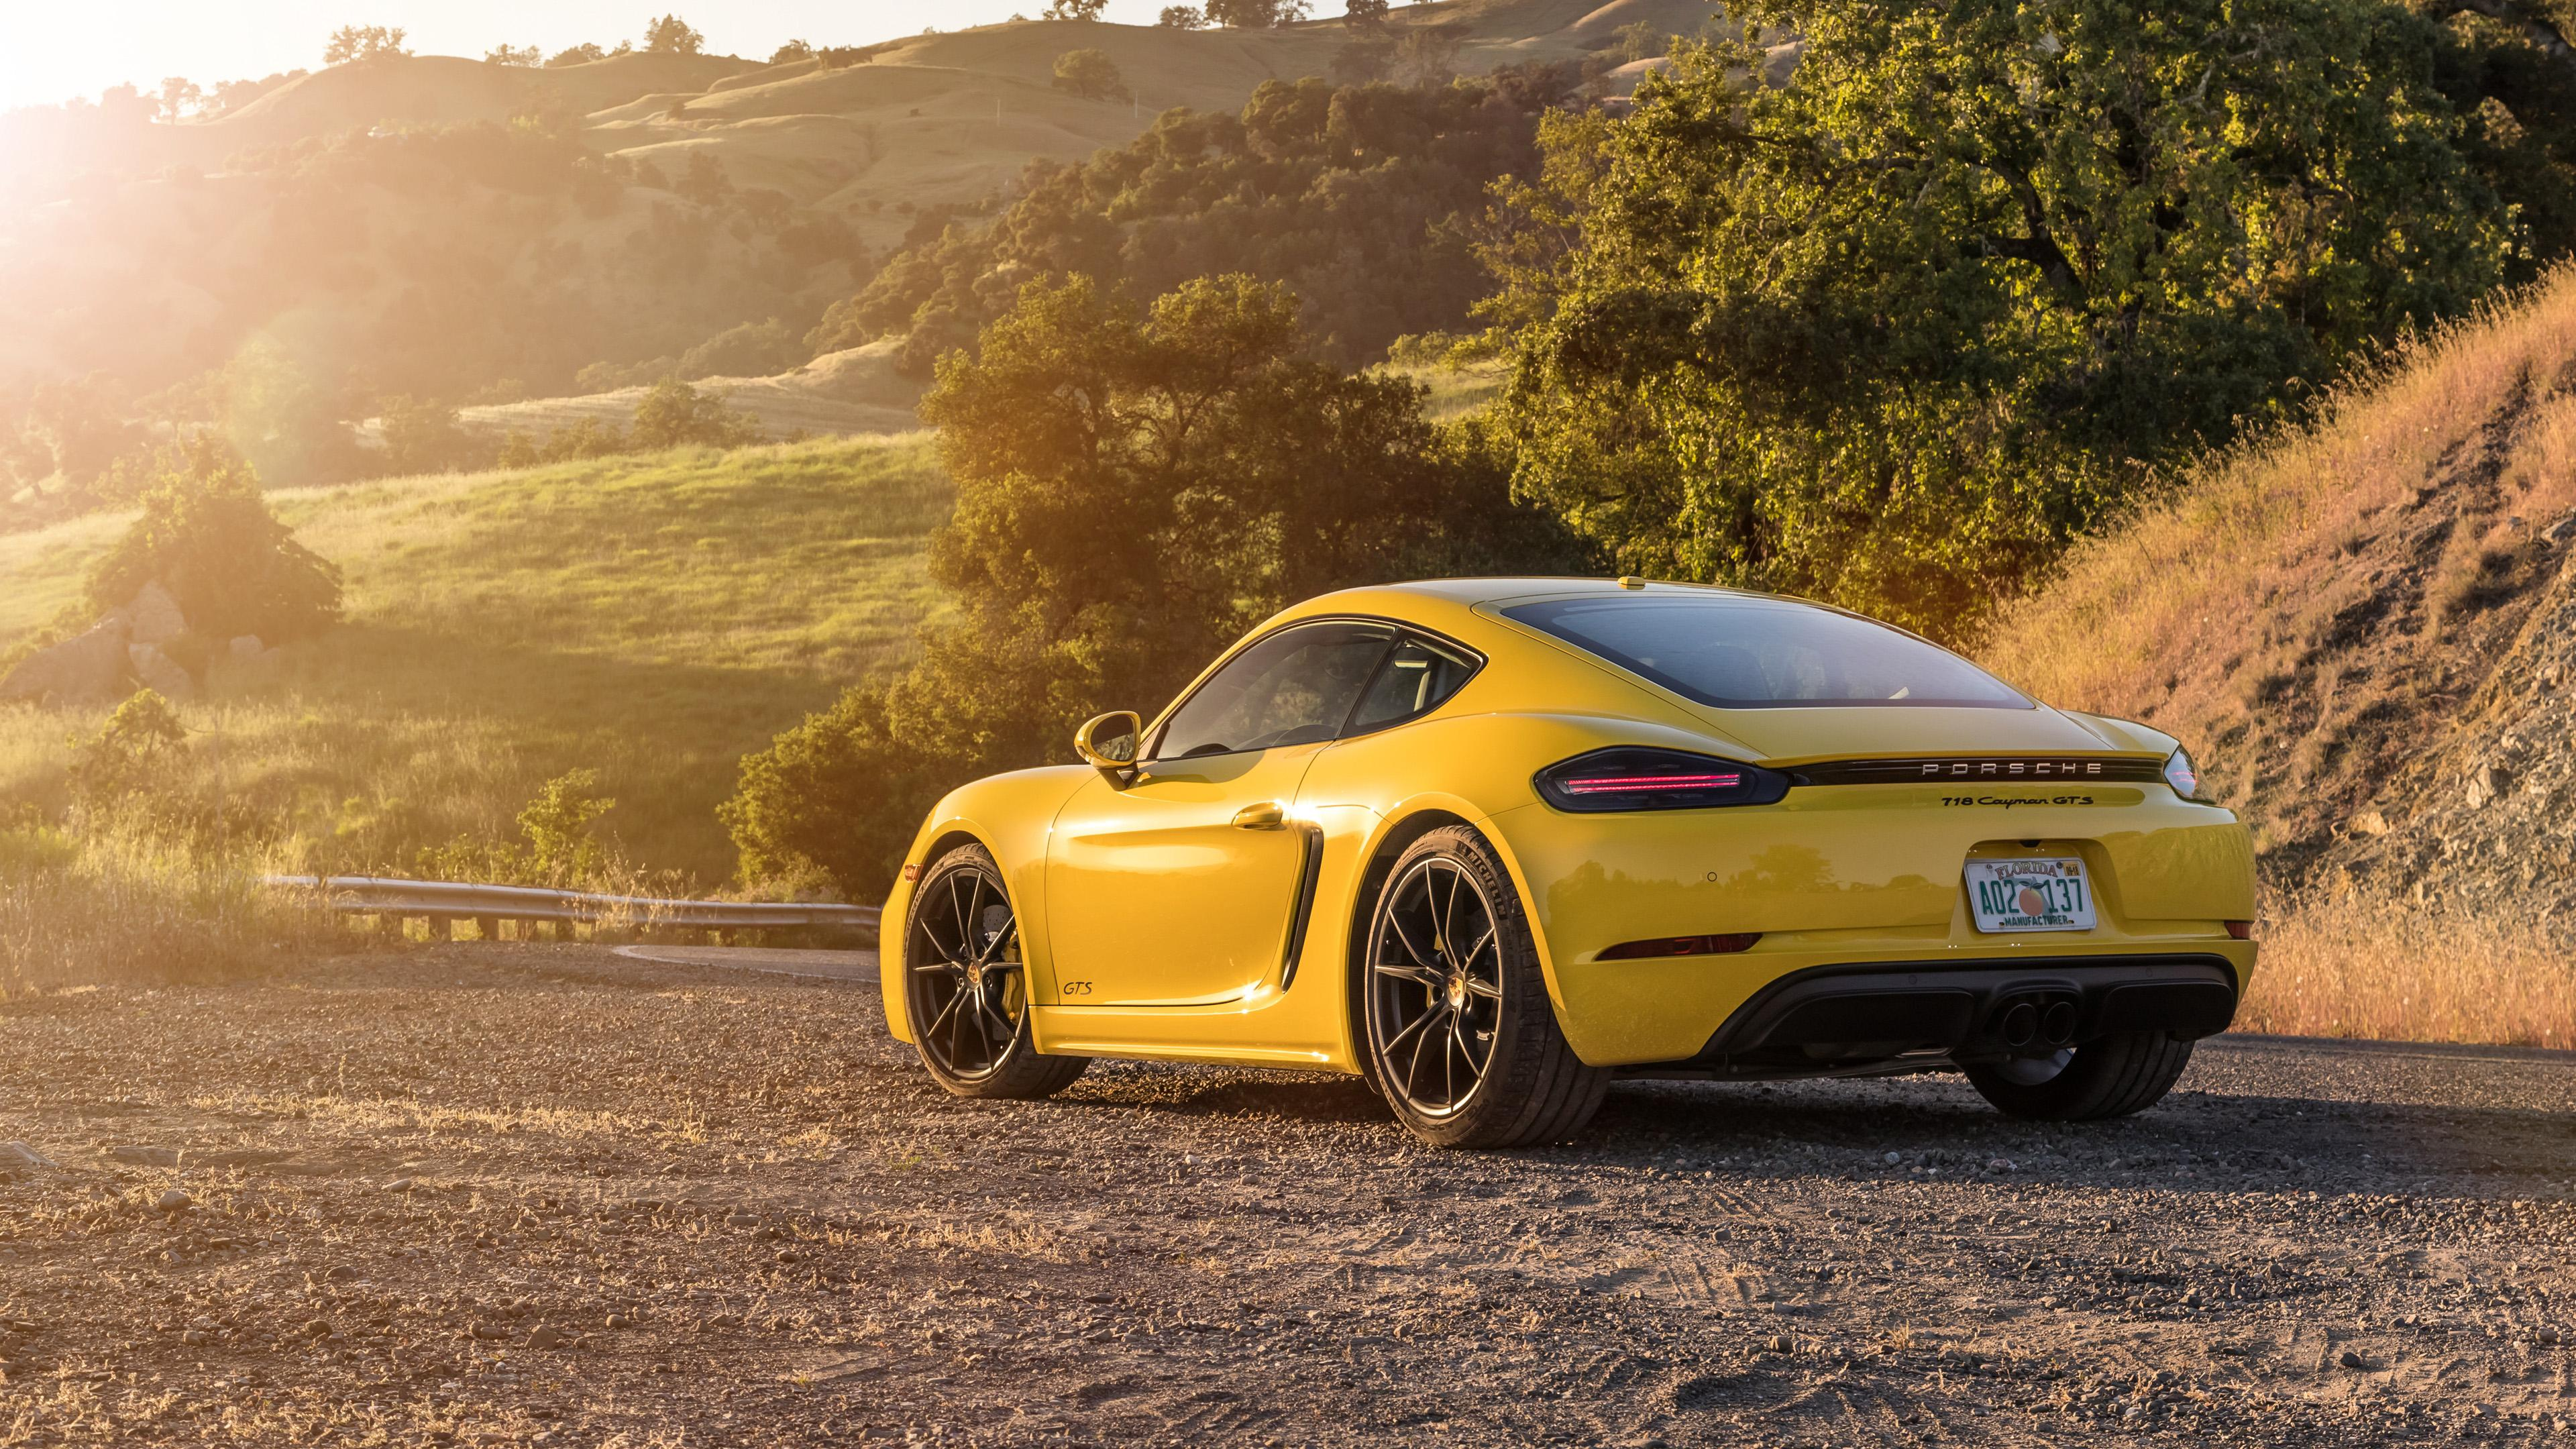 New Porsche 718 Cayman Gts 4 0 2020 Interior Exterior Youtube